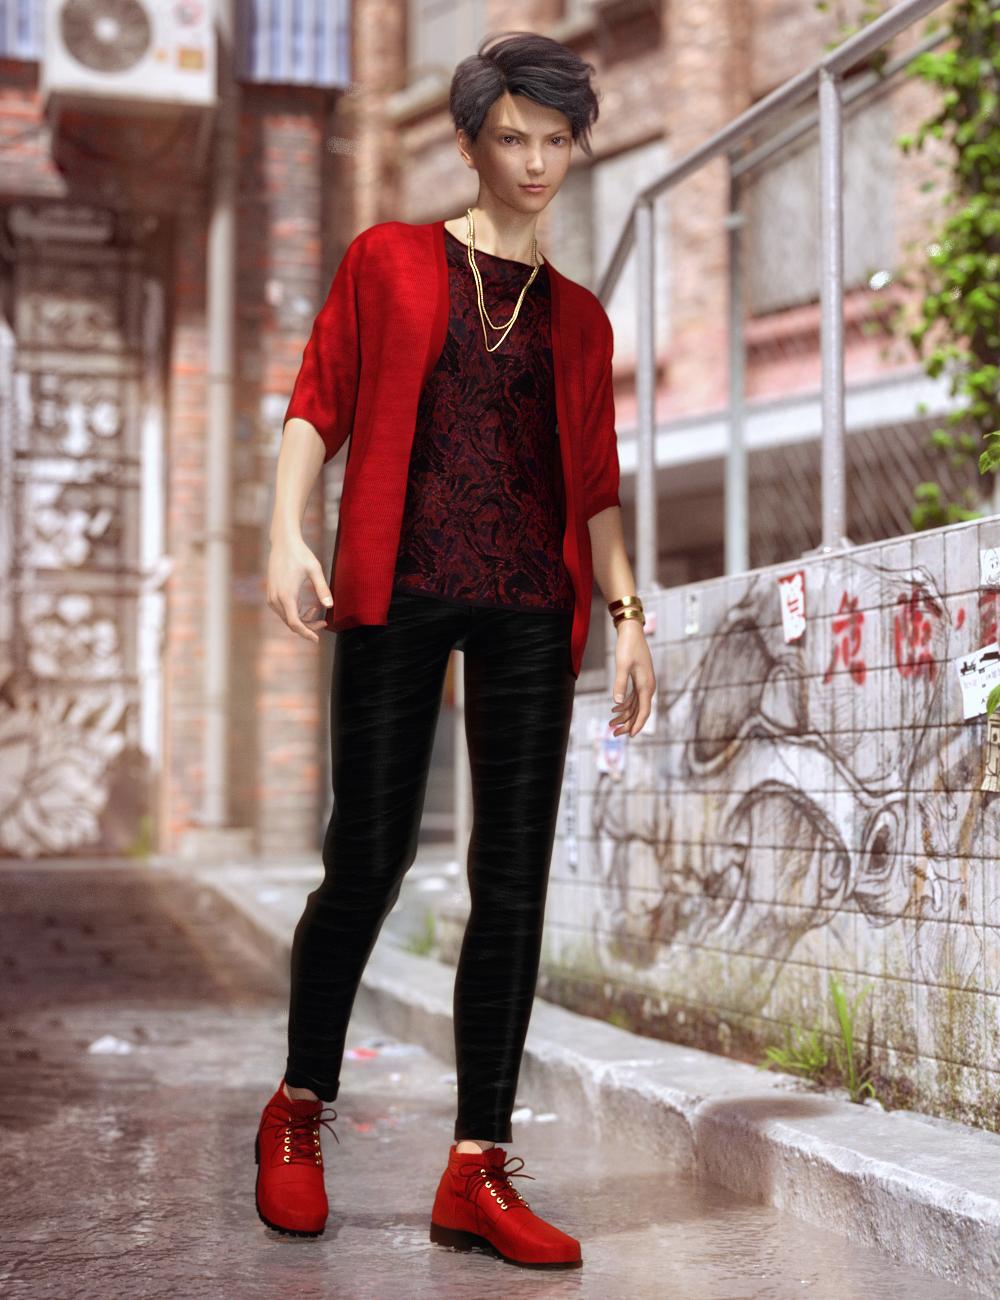 dForce Pop Style Outfit for Genesis 8 Male(s) by: Barbara BrundonOziChick, 3D Models by Daz 3D